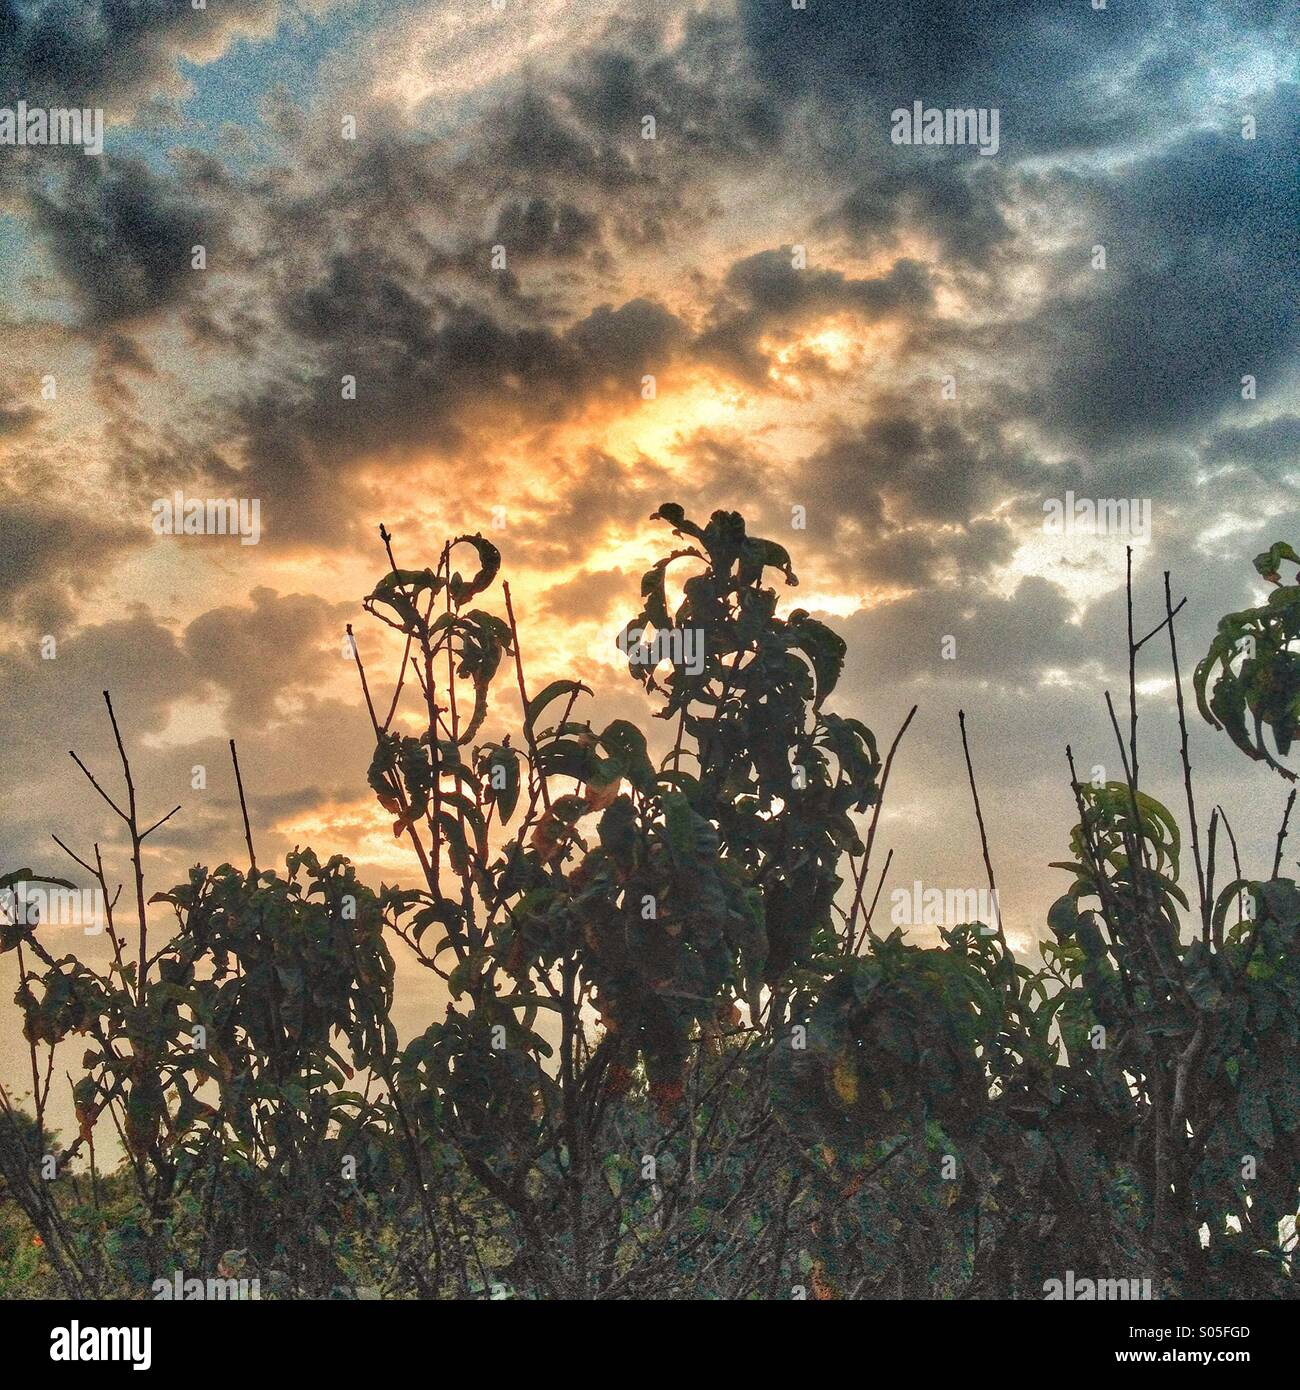 Tall weeds contro un nuvoloso cielo sunrise Immagini Stock